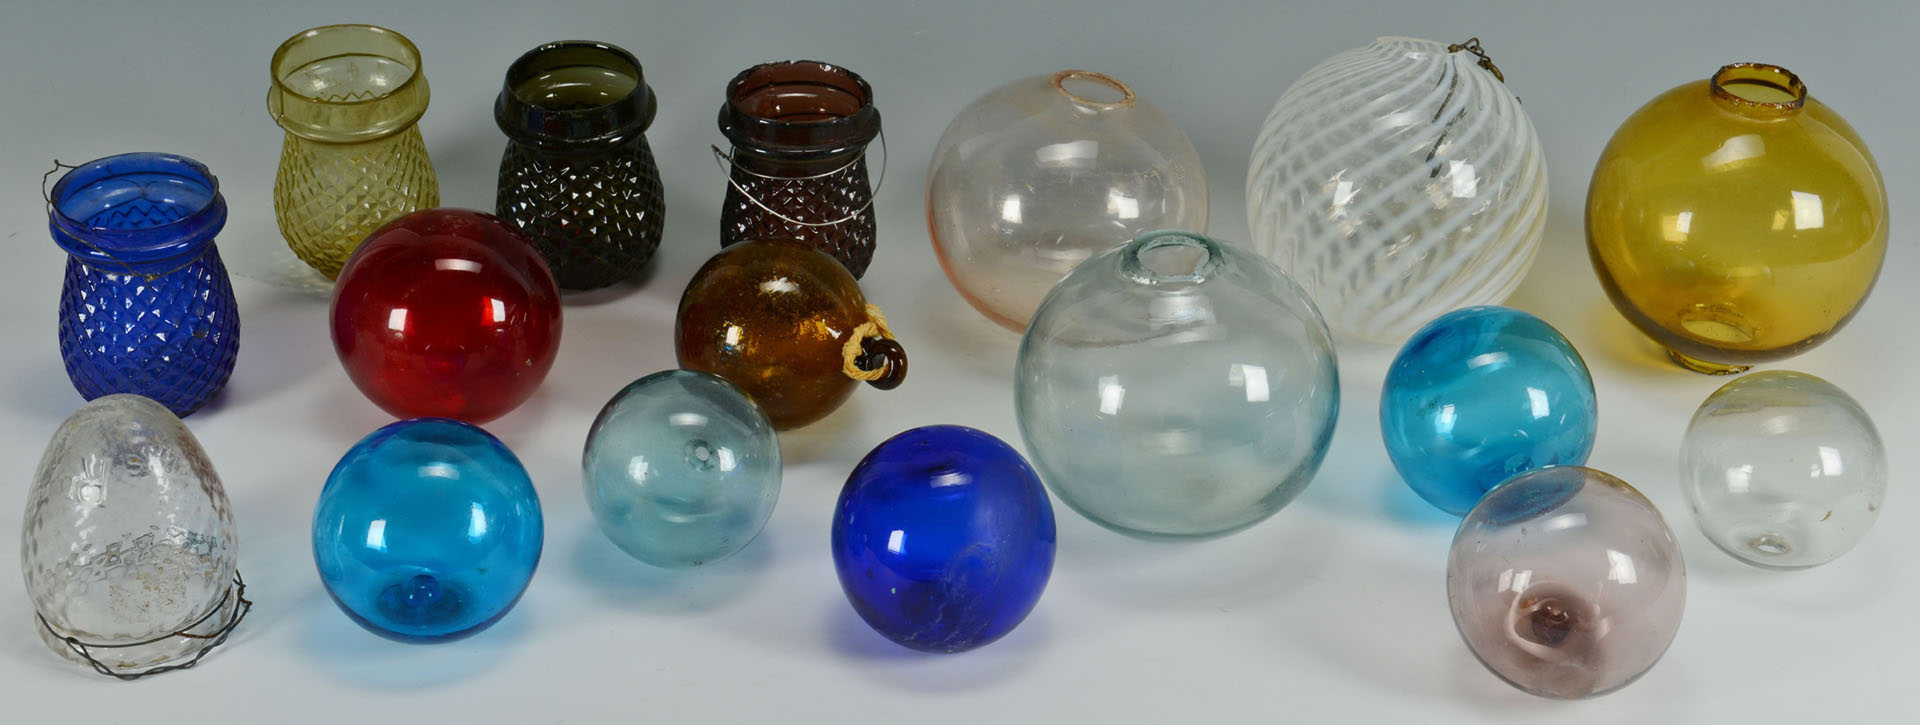 Glass Christmas Ornaments & Balls, 17 pcs.